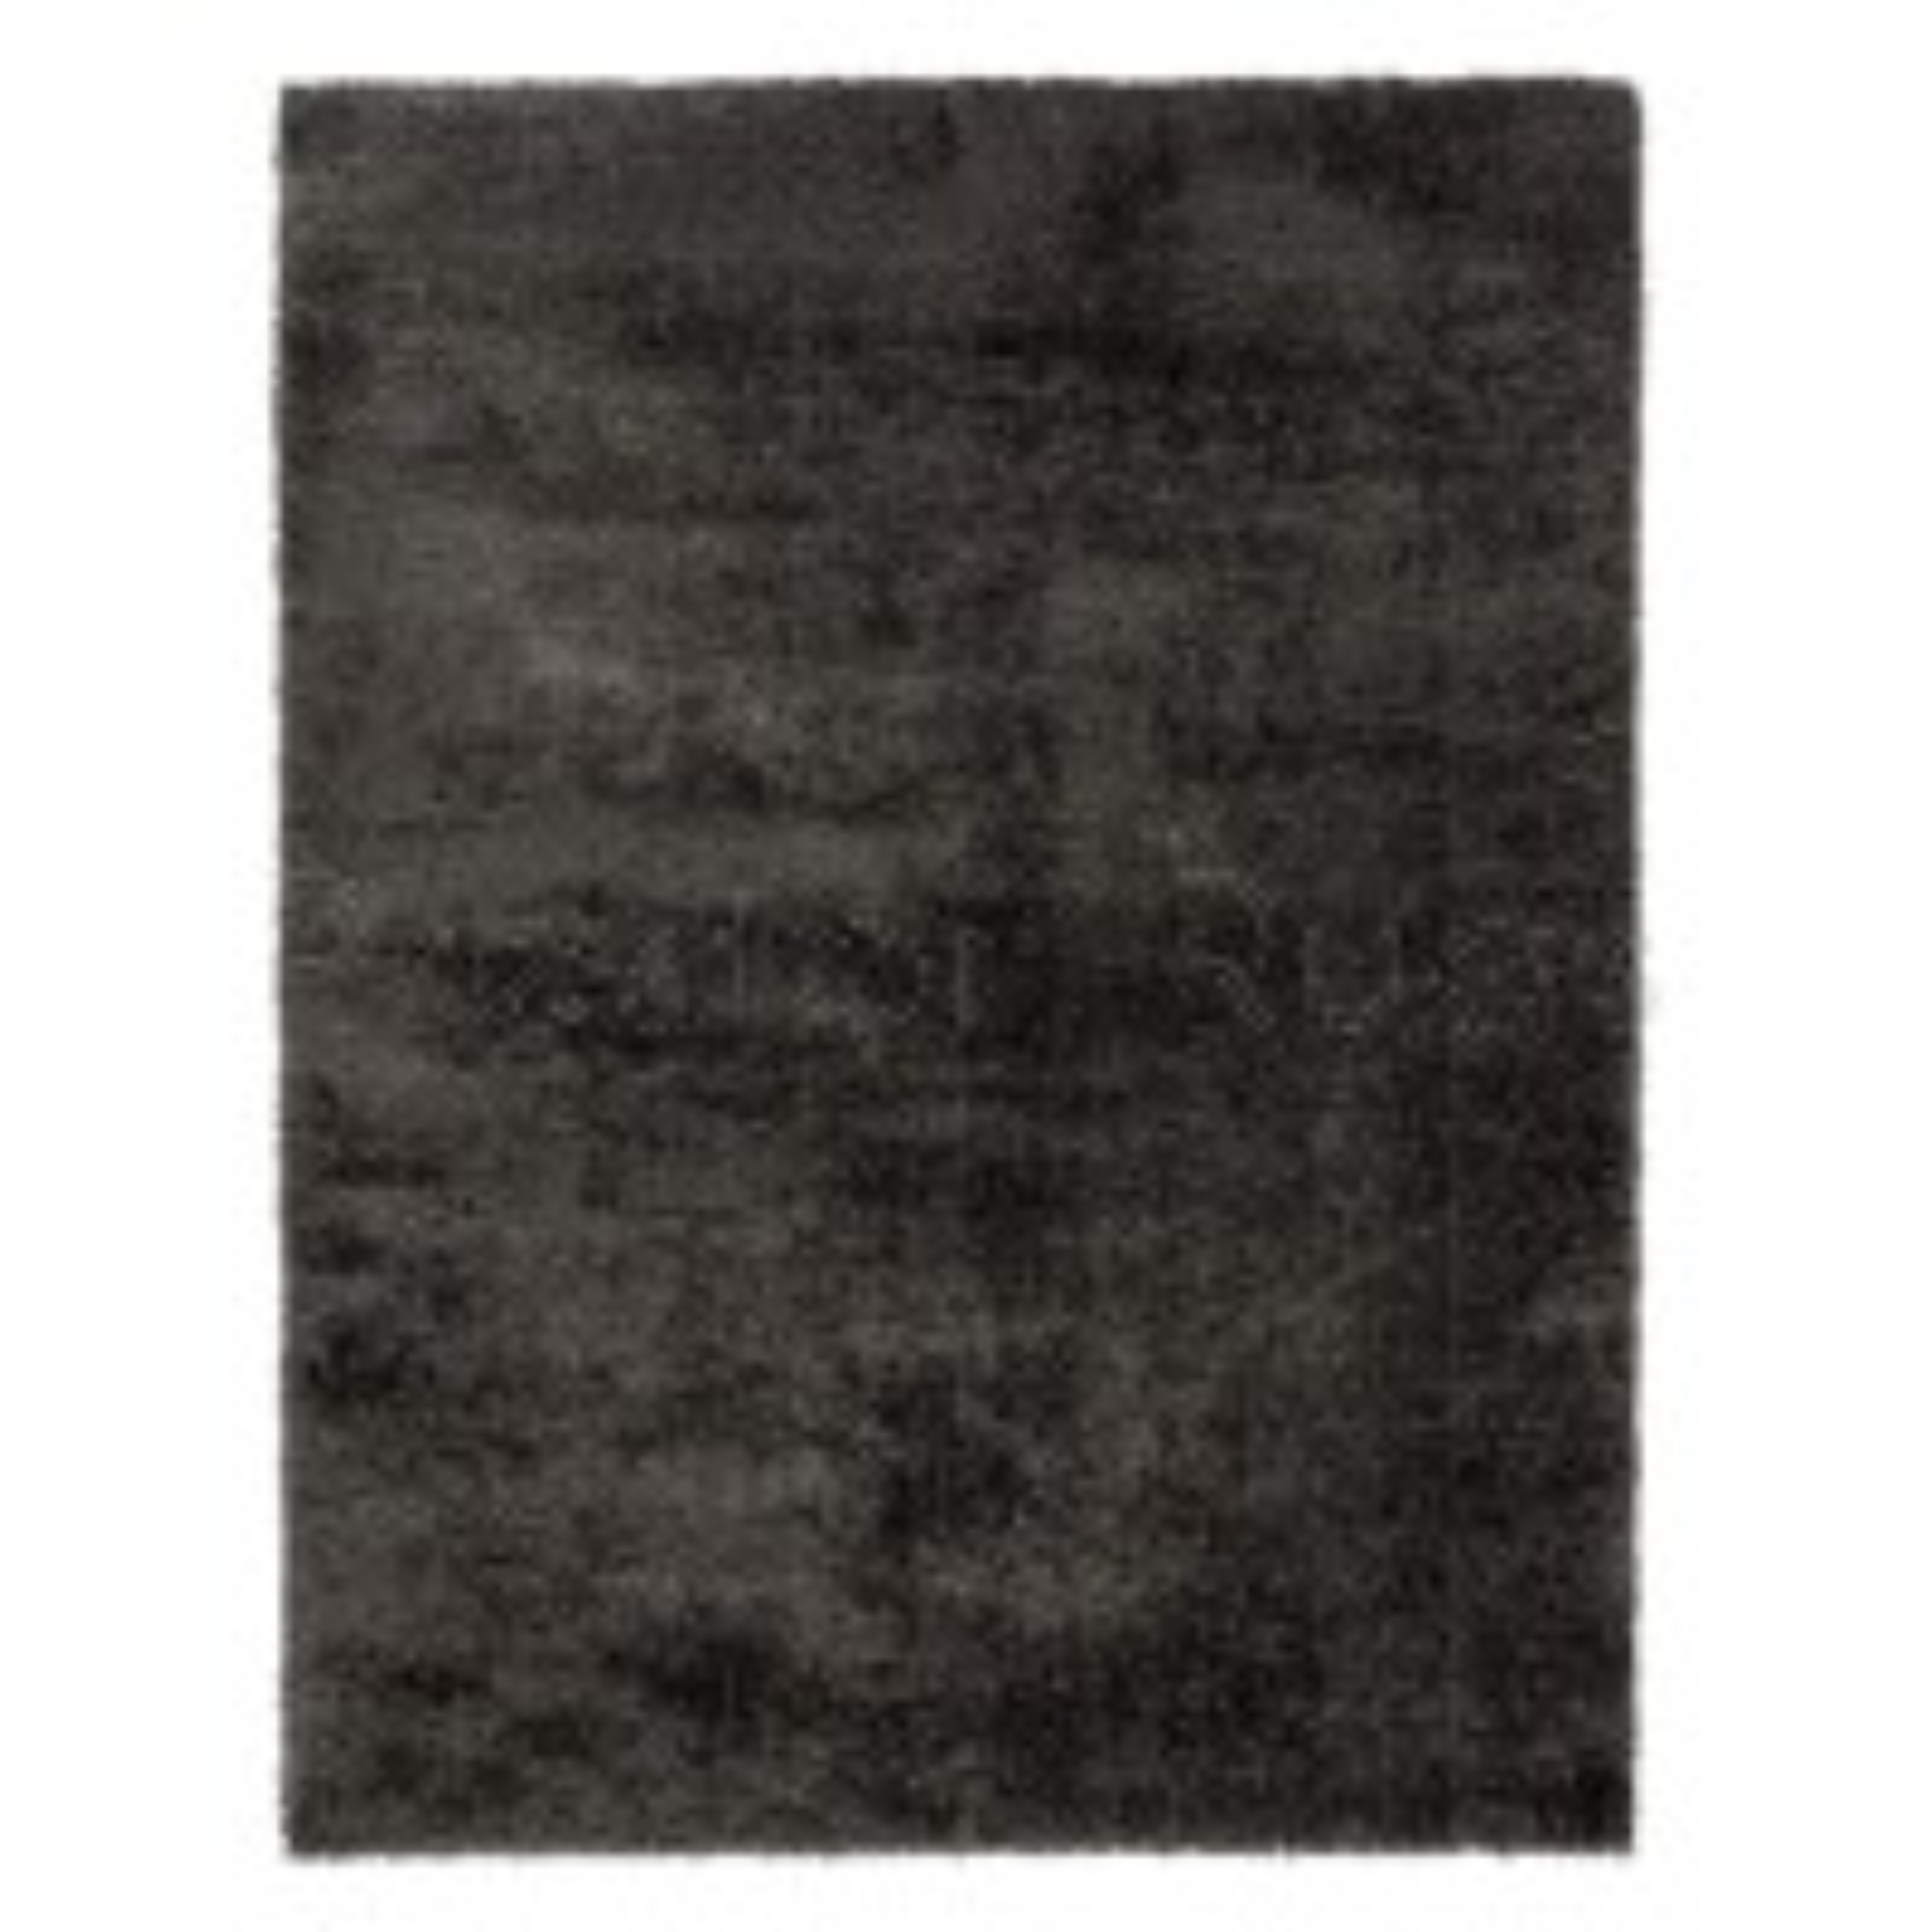 "Velvet Shaggy Rug - Charcoal - Size 80 x 150 cm (2'8"" x 5')"